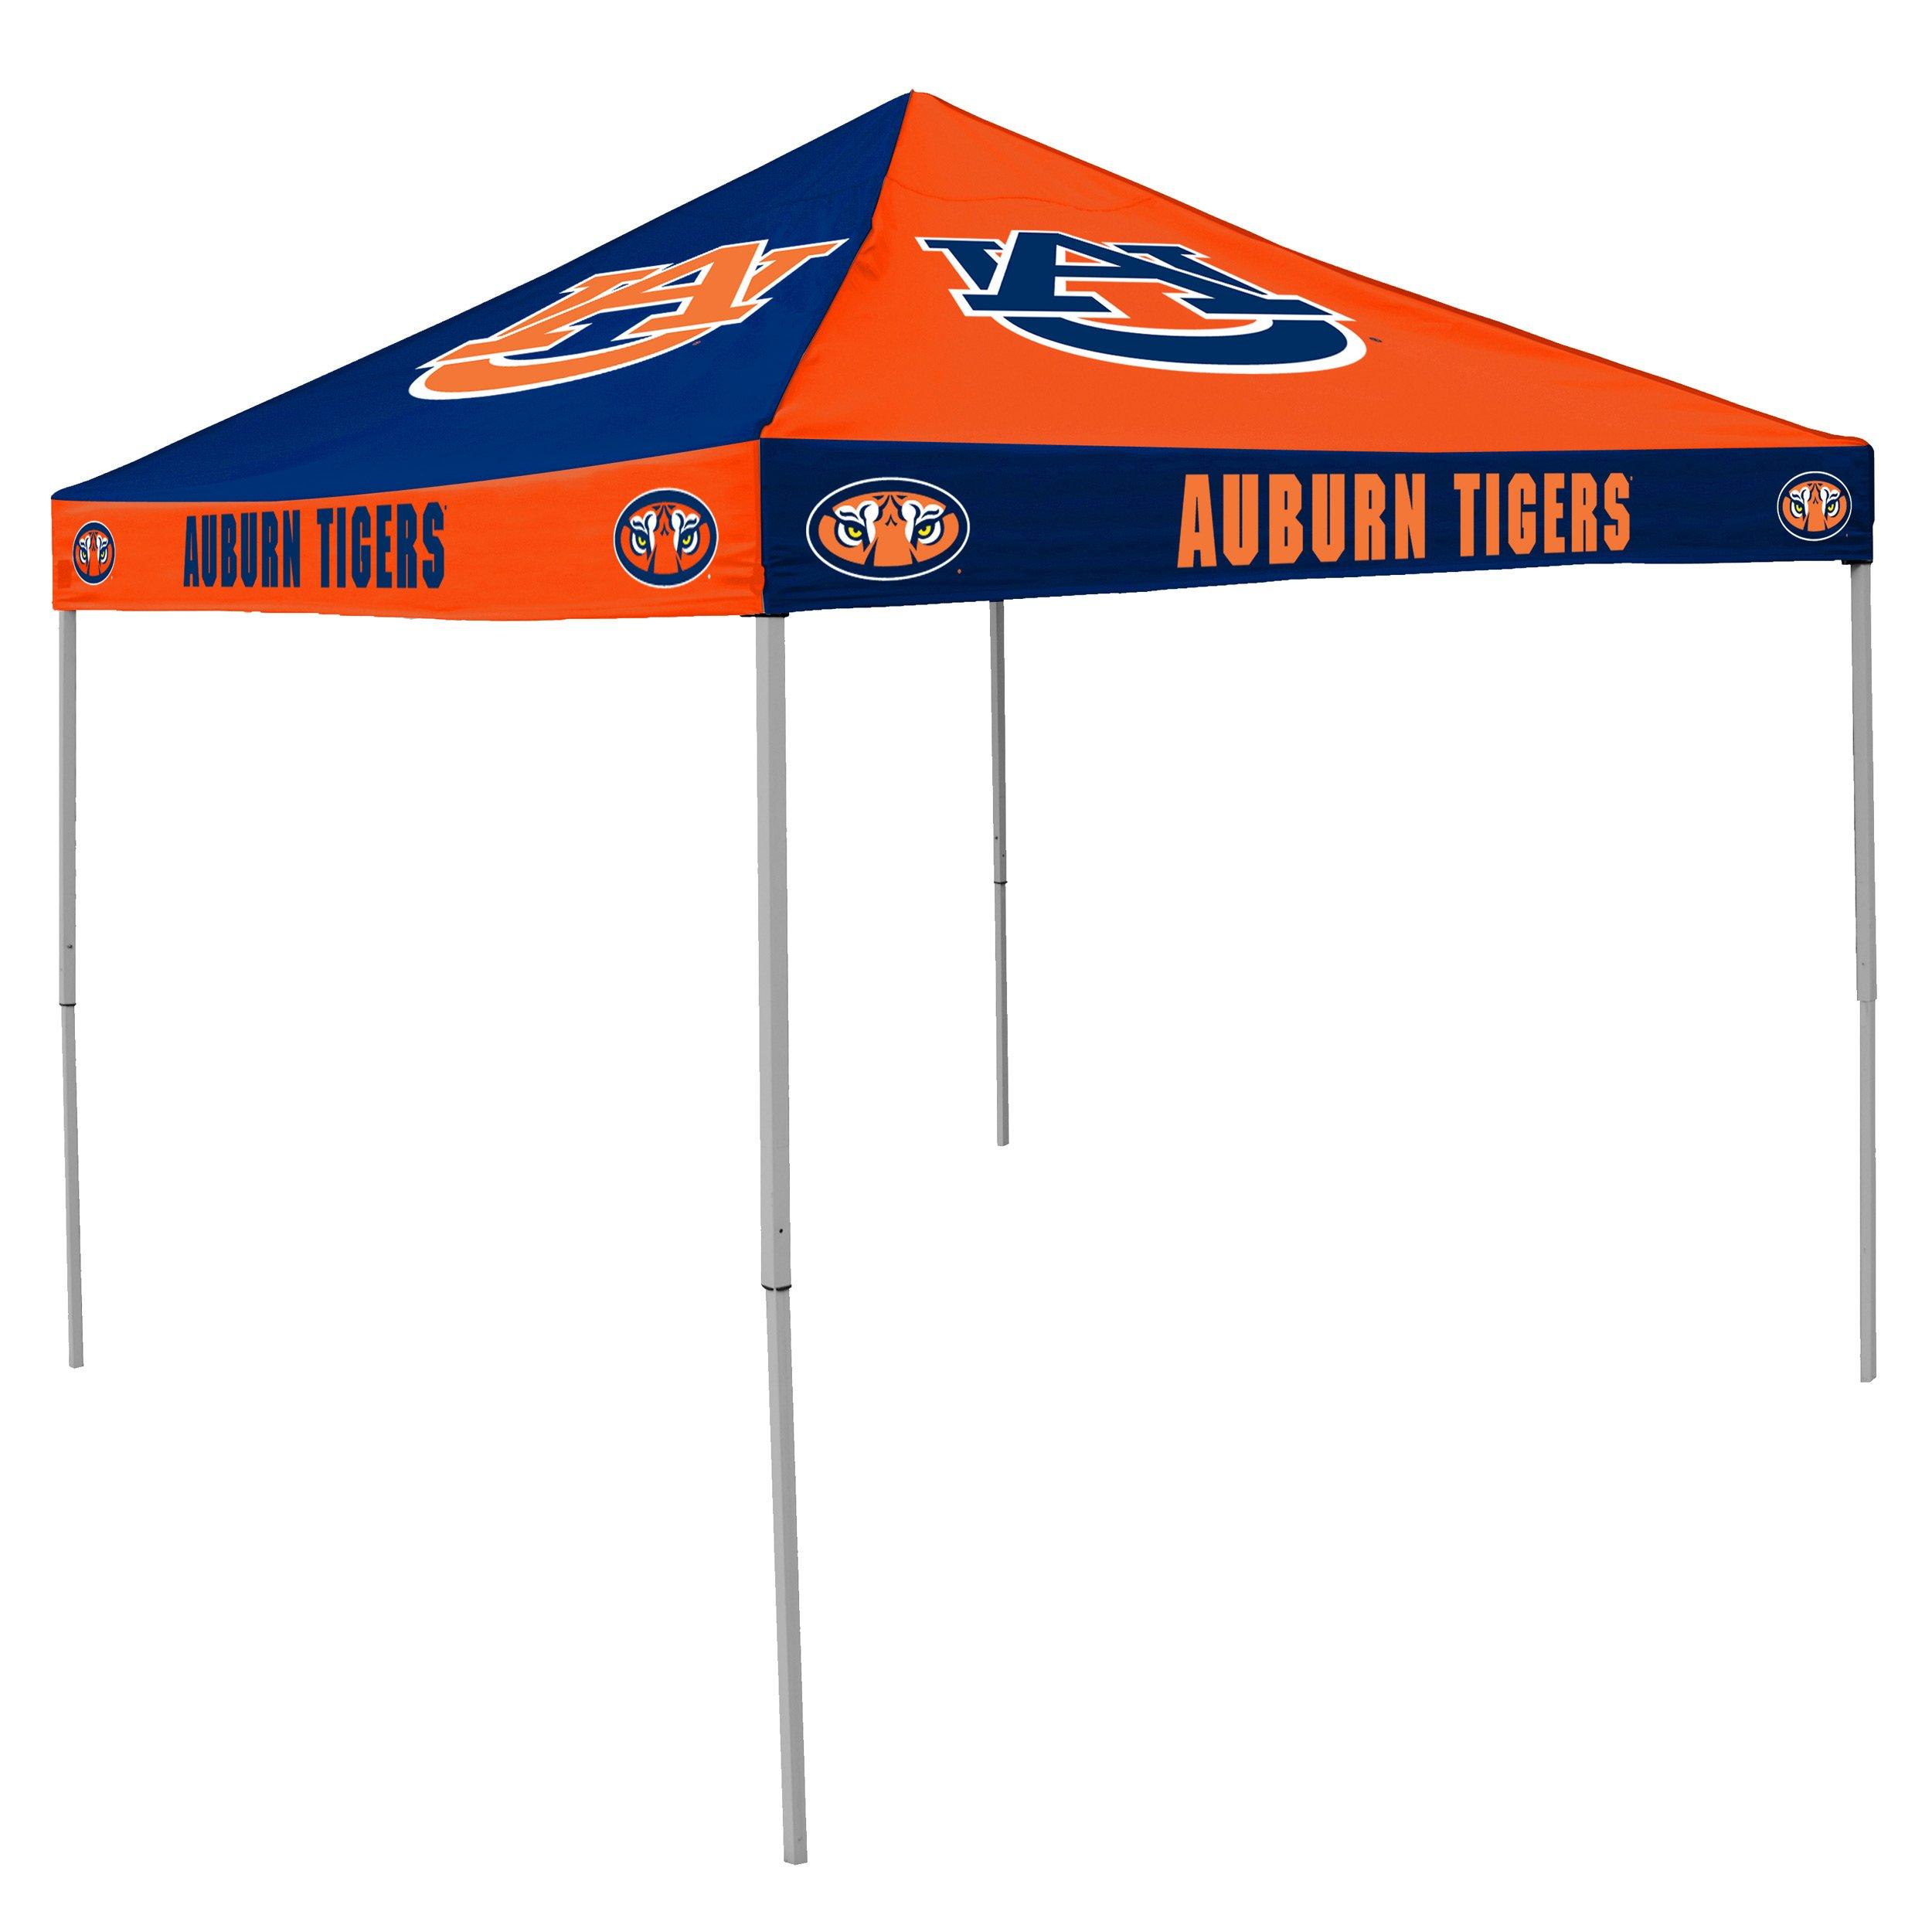 NCAA Auburn Tigers Checkerboard Tent